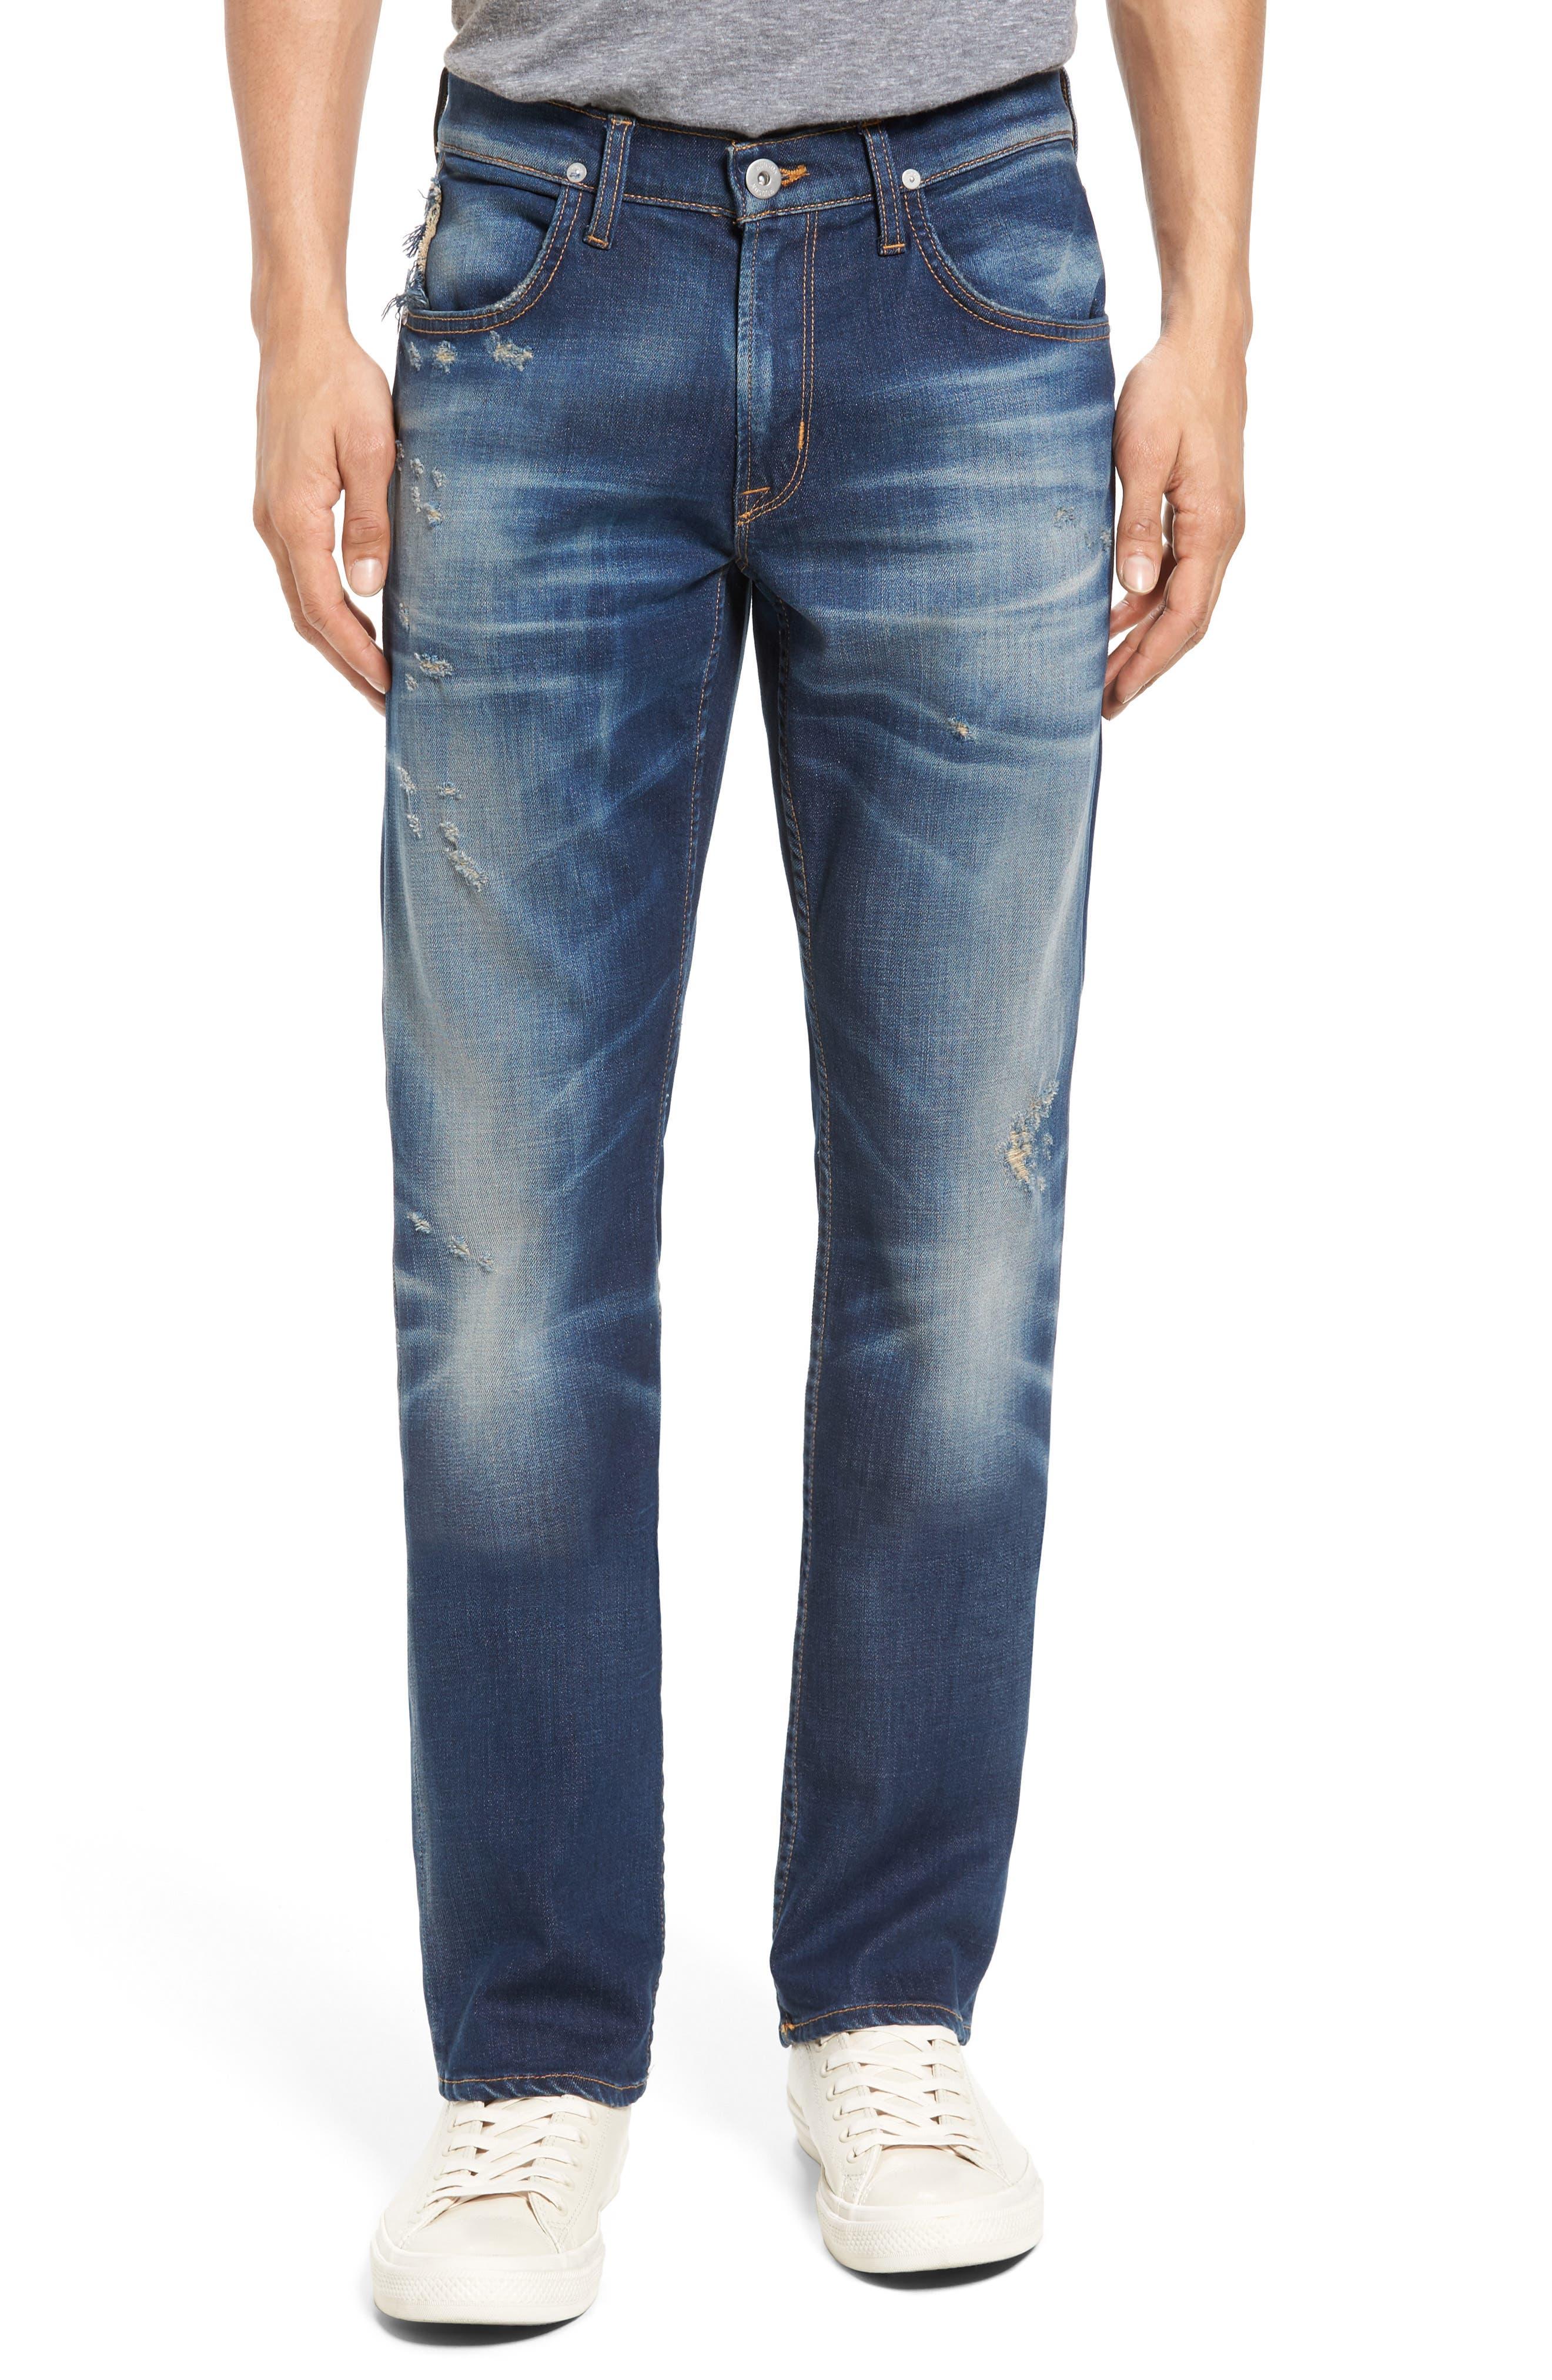 Byron Slim Straight Leg Jeans,                             Main thumbnail 1, color,                             401